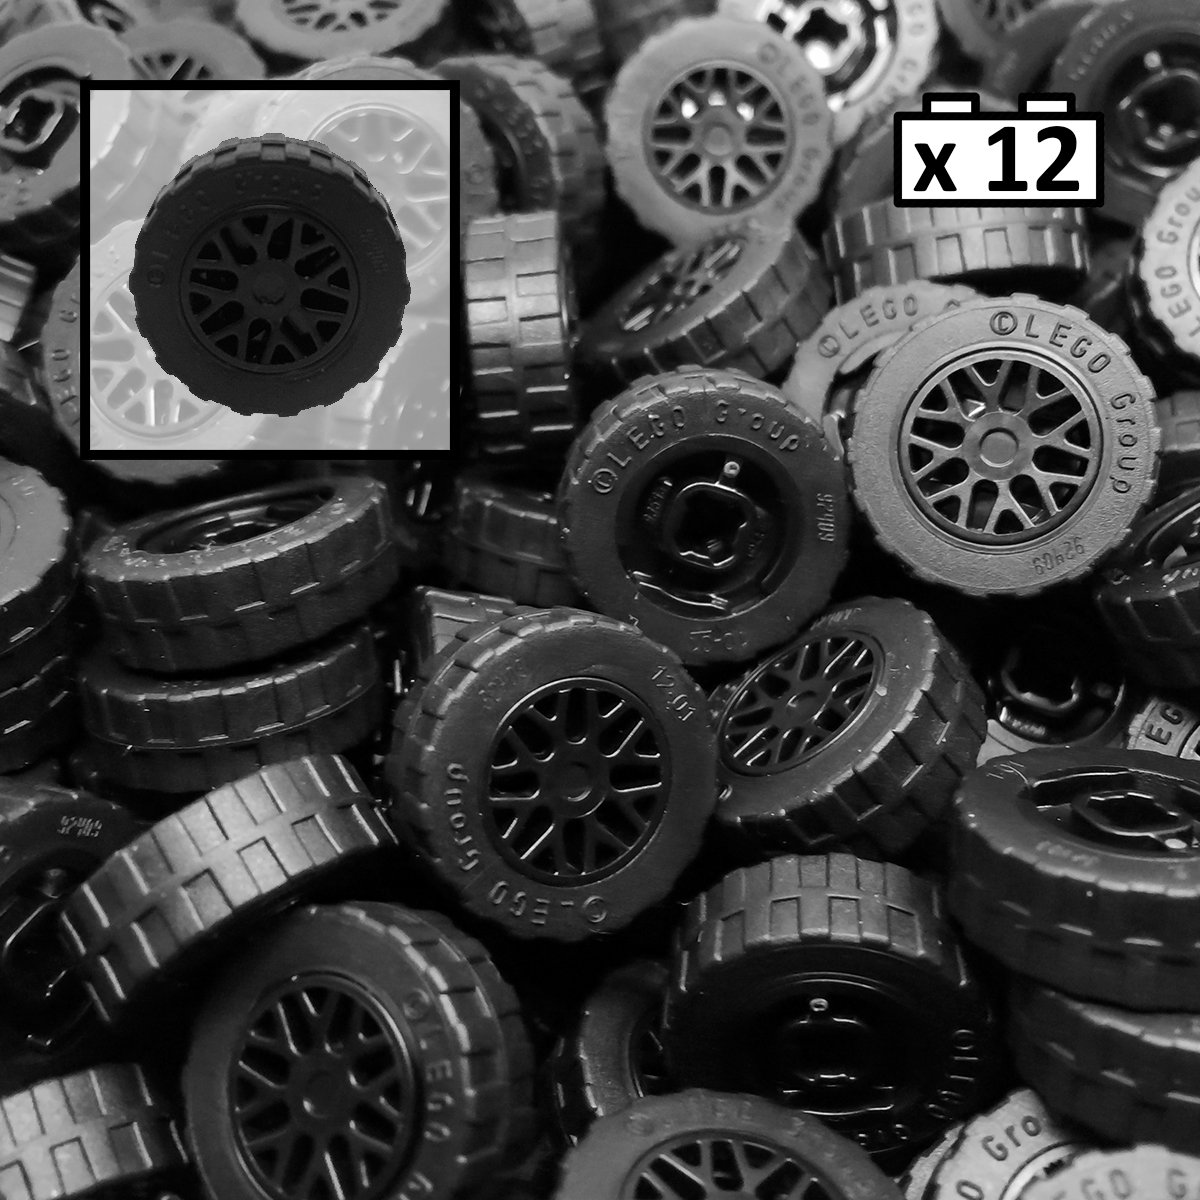 Tires ~ 4 Car//Truck Tires ~ Light Gray Spoked Rims ~ Technics ~ NEW ~ Lego